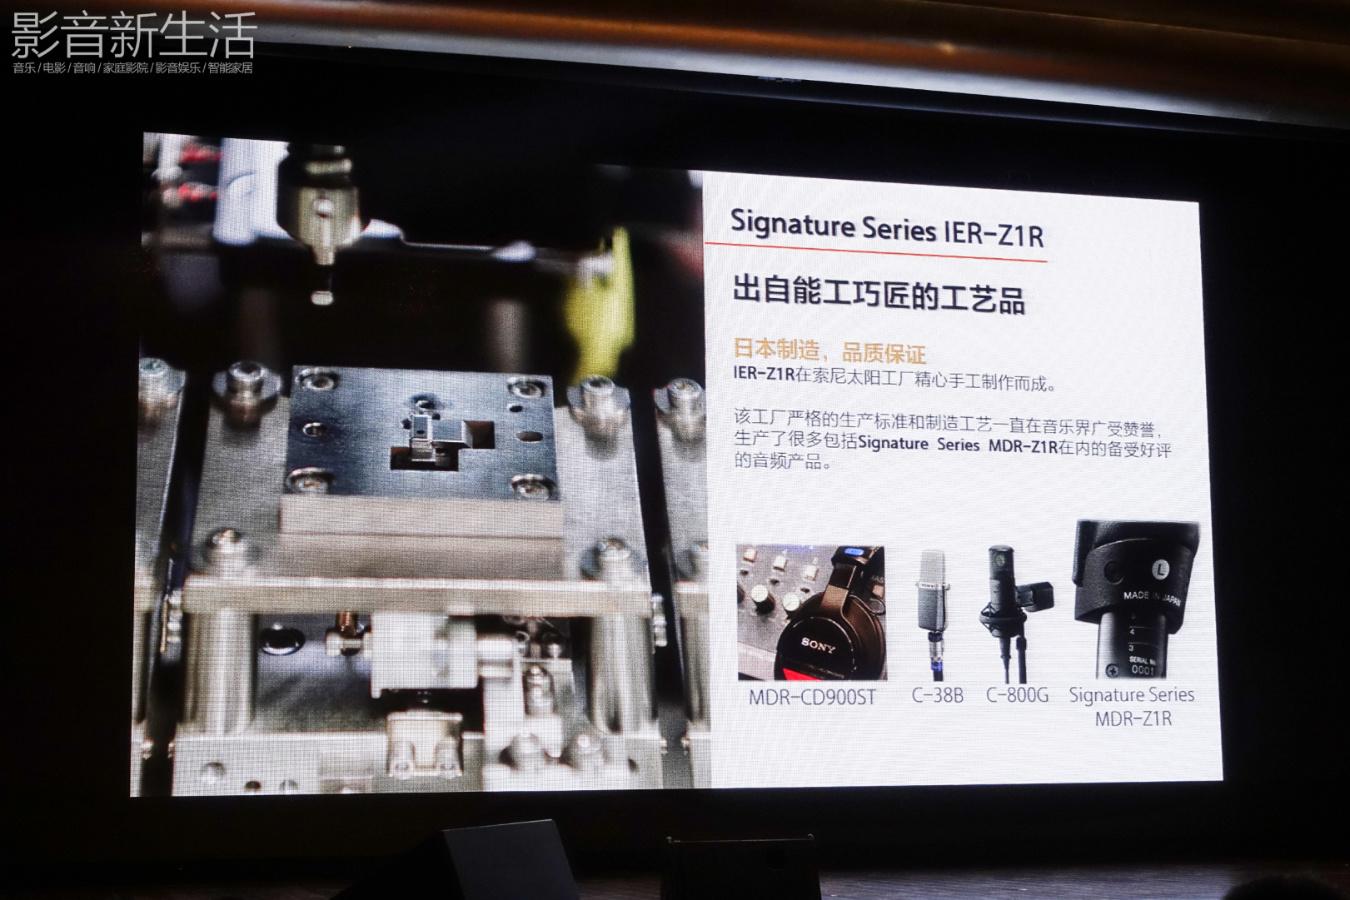 "Sony Hi Res 2018 7 - 新品 | ""重塑随身音乐娱乐王朝!"":Sony索尼发布Signature醇音系列新兄弟IER-Z1R和DMP-Z1,以及舞台监听耳机系列:IER-M7和IER-M9,还有升级款MDR-Z7M2!"